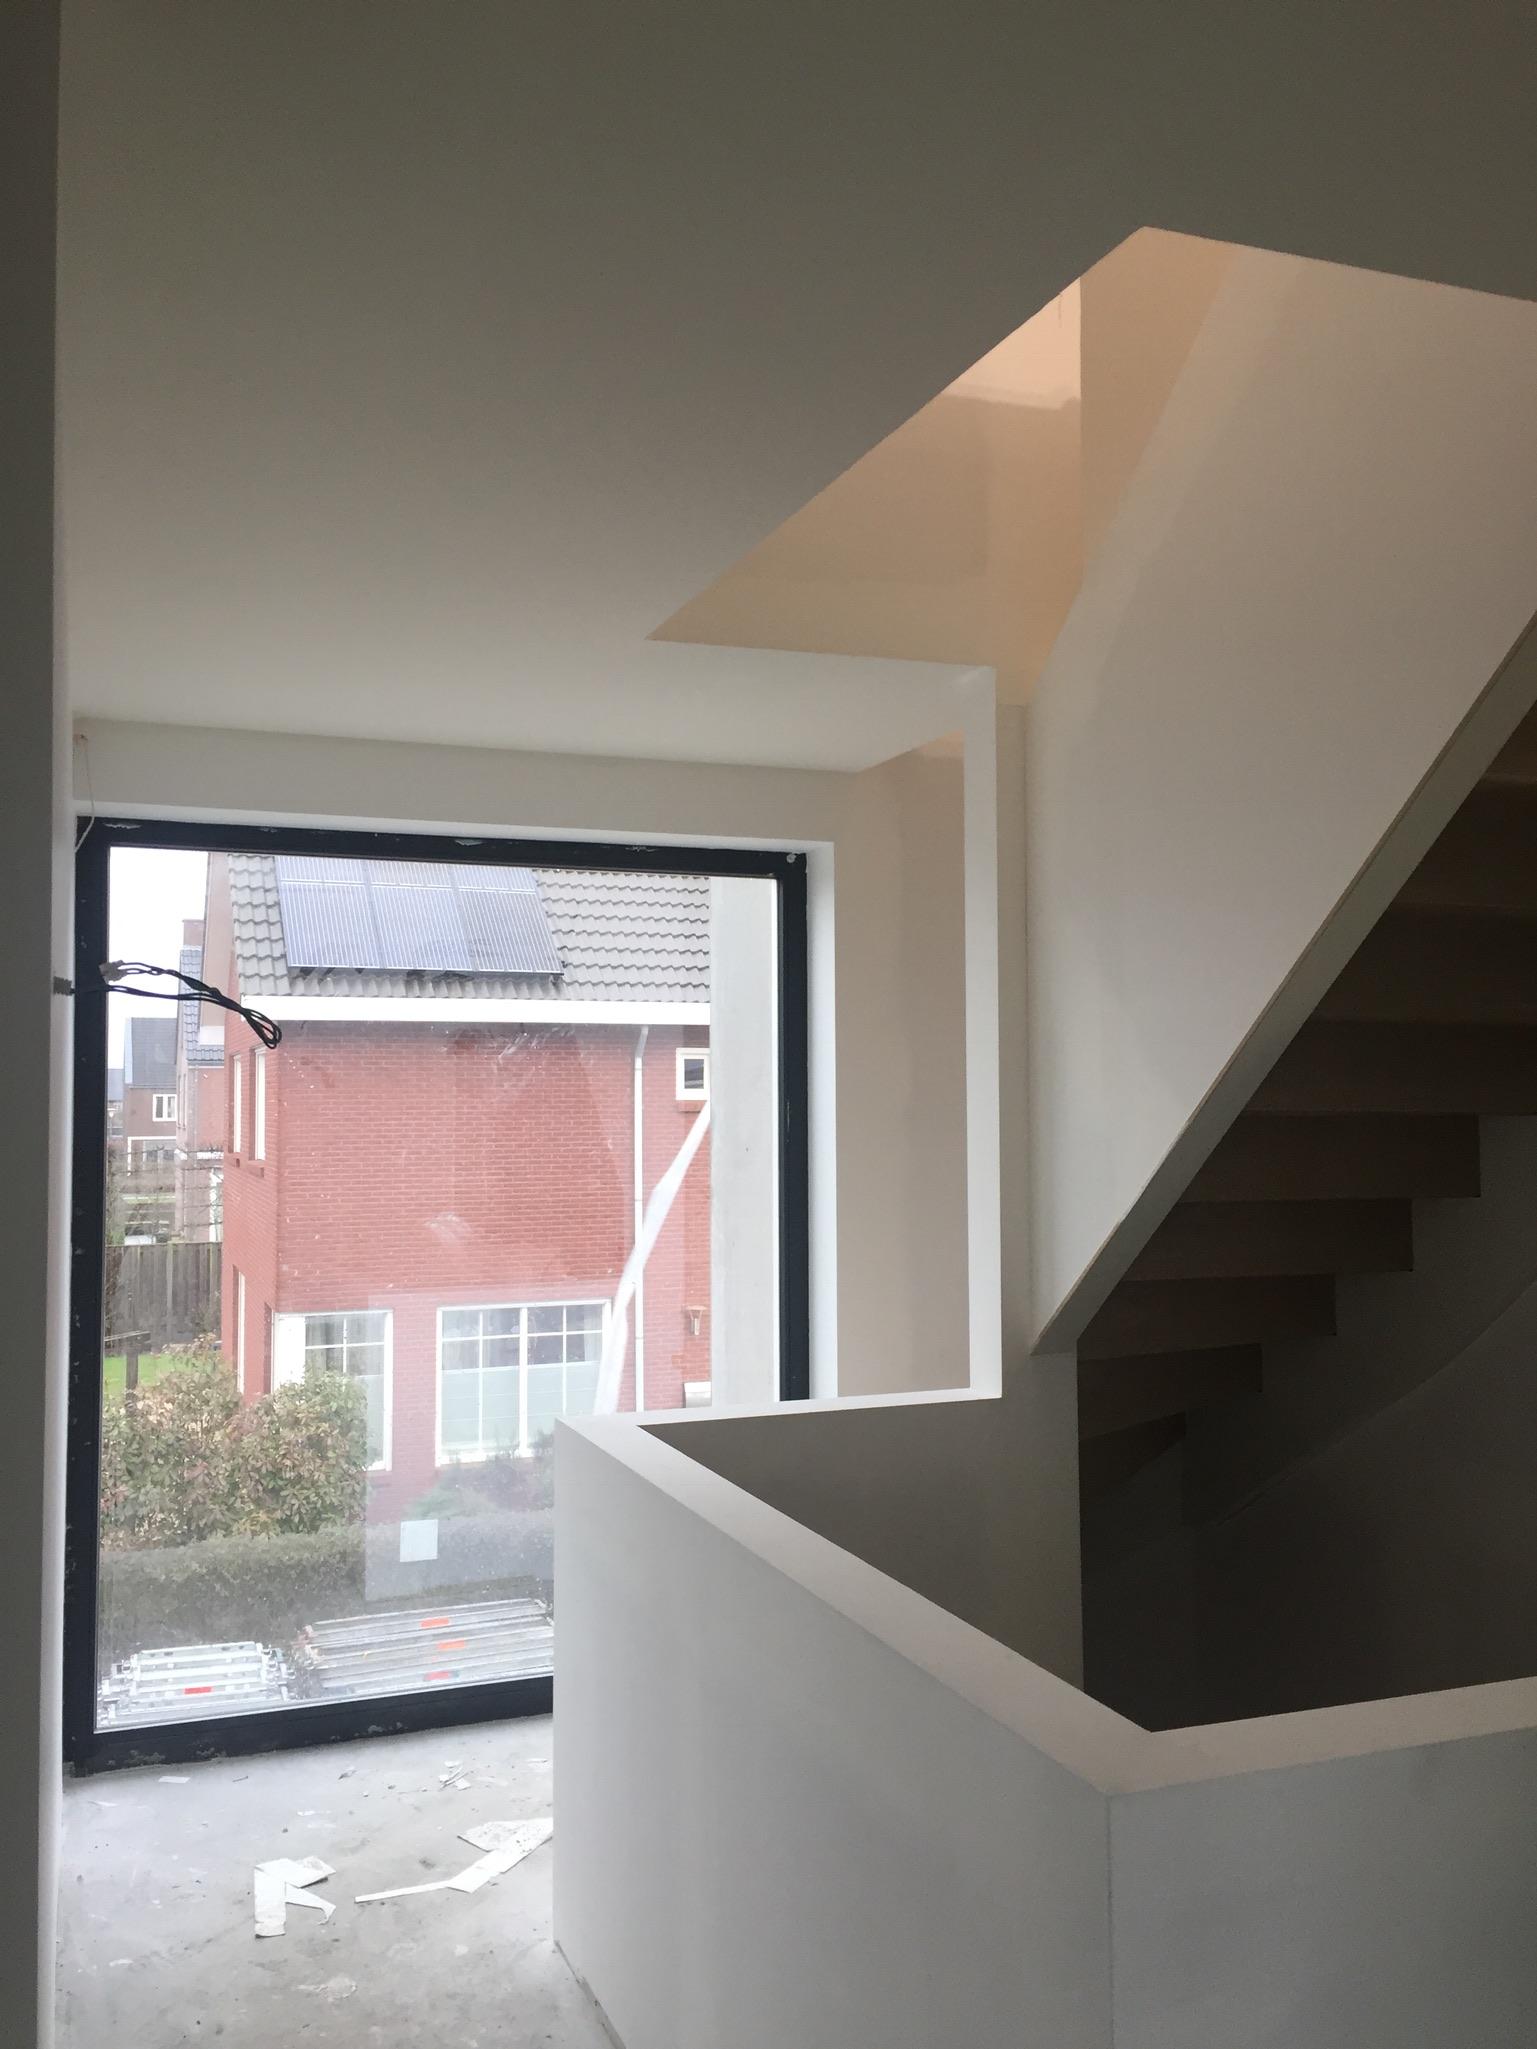 http://uploads.metsander.nl/huis-3-20170727.JPG